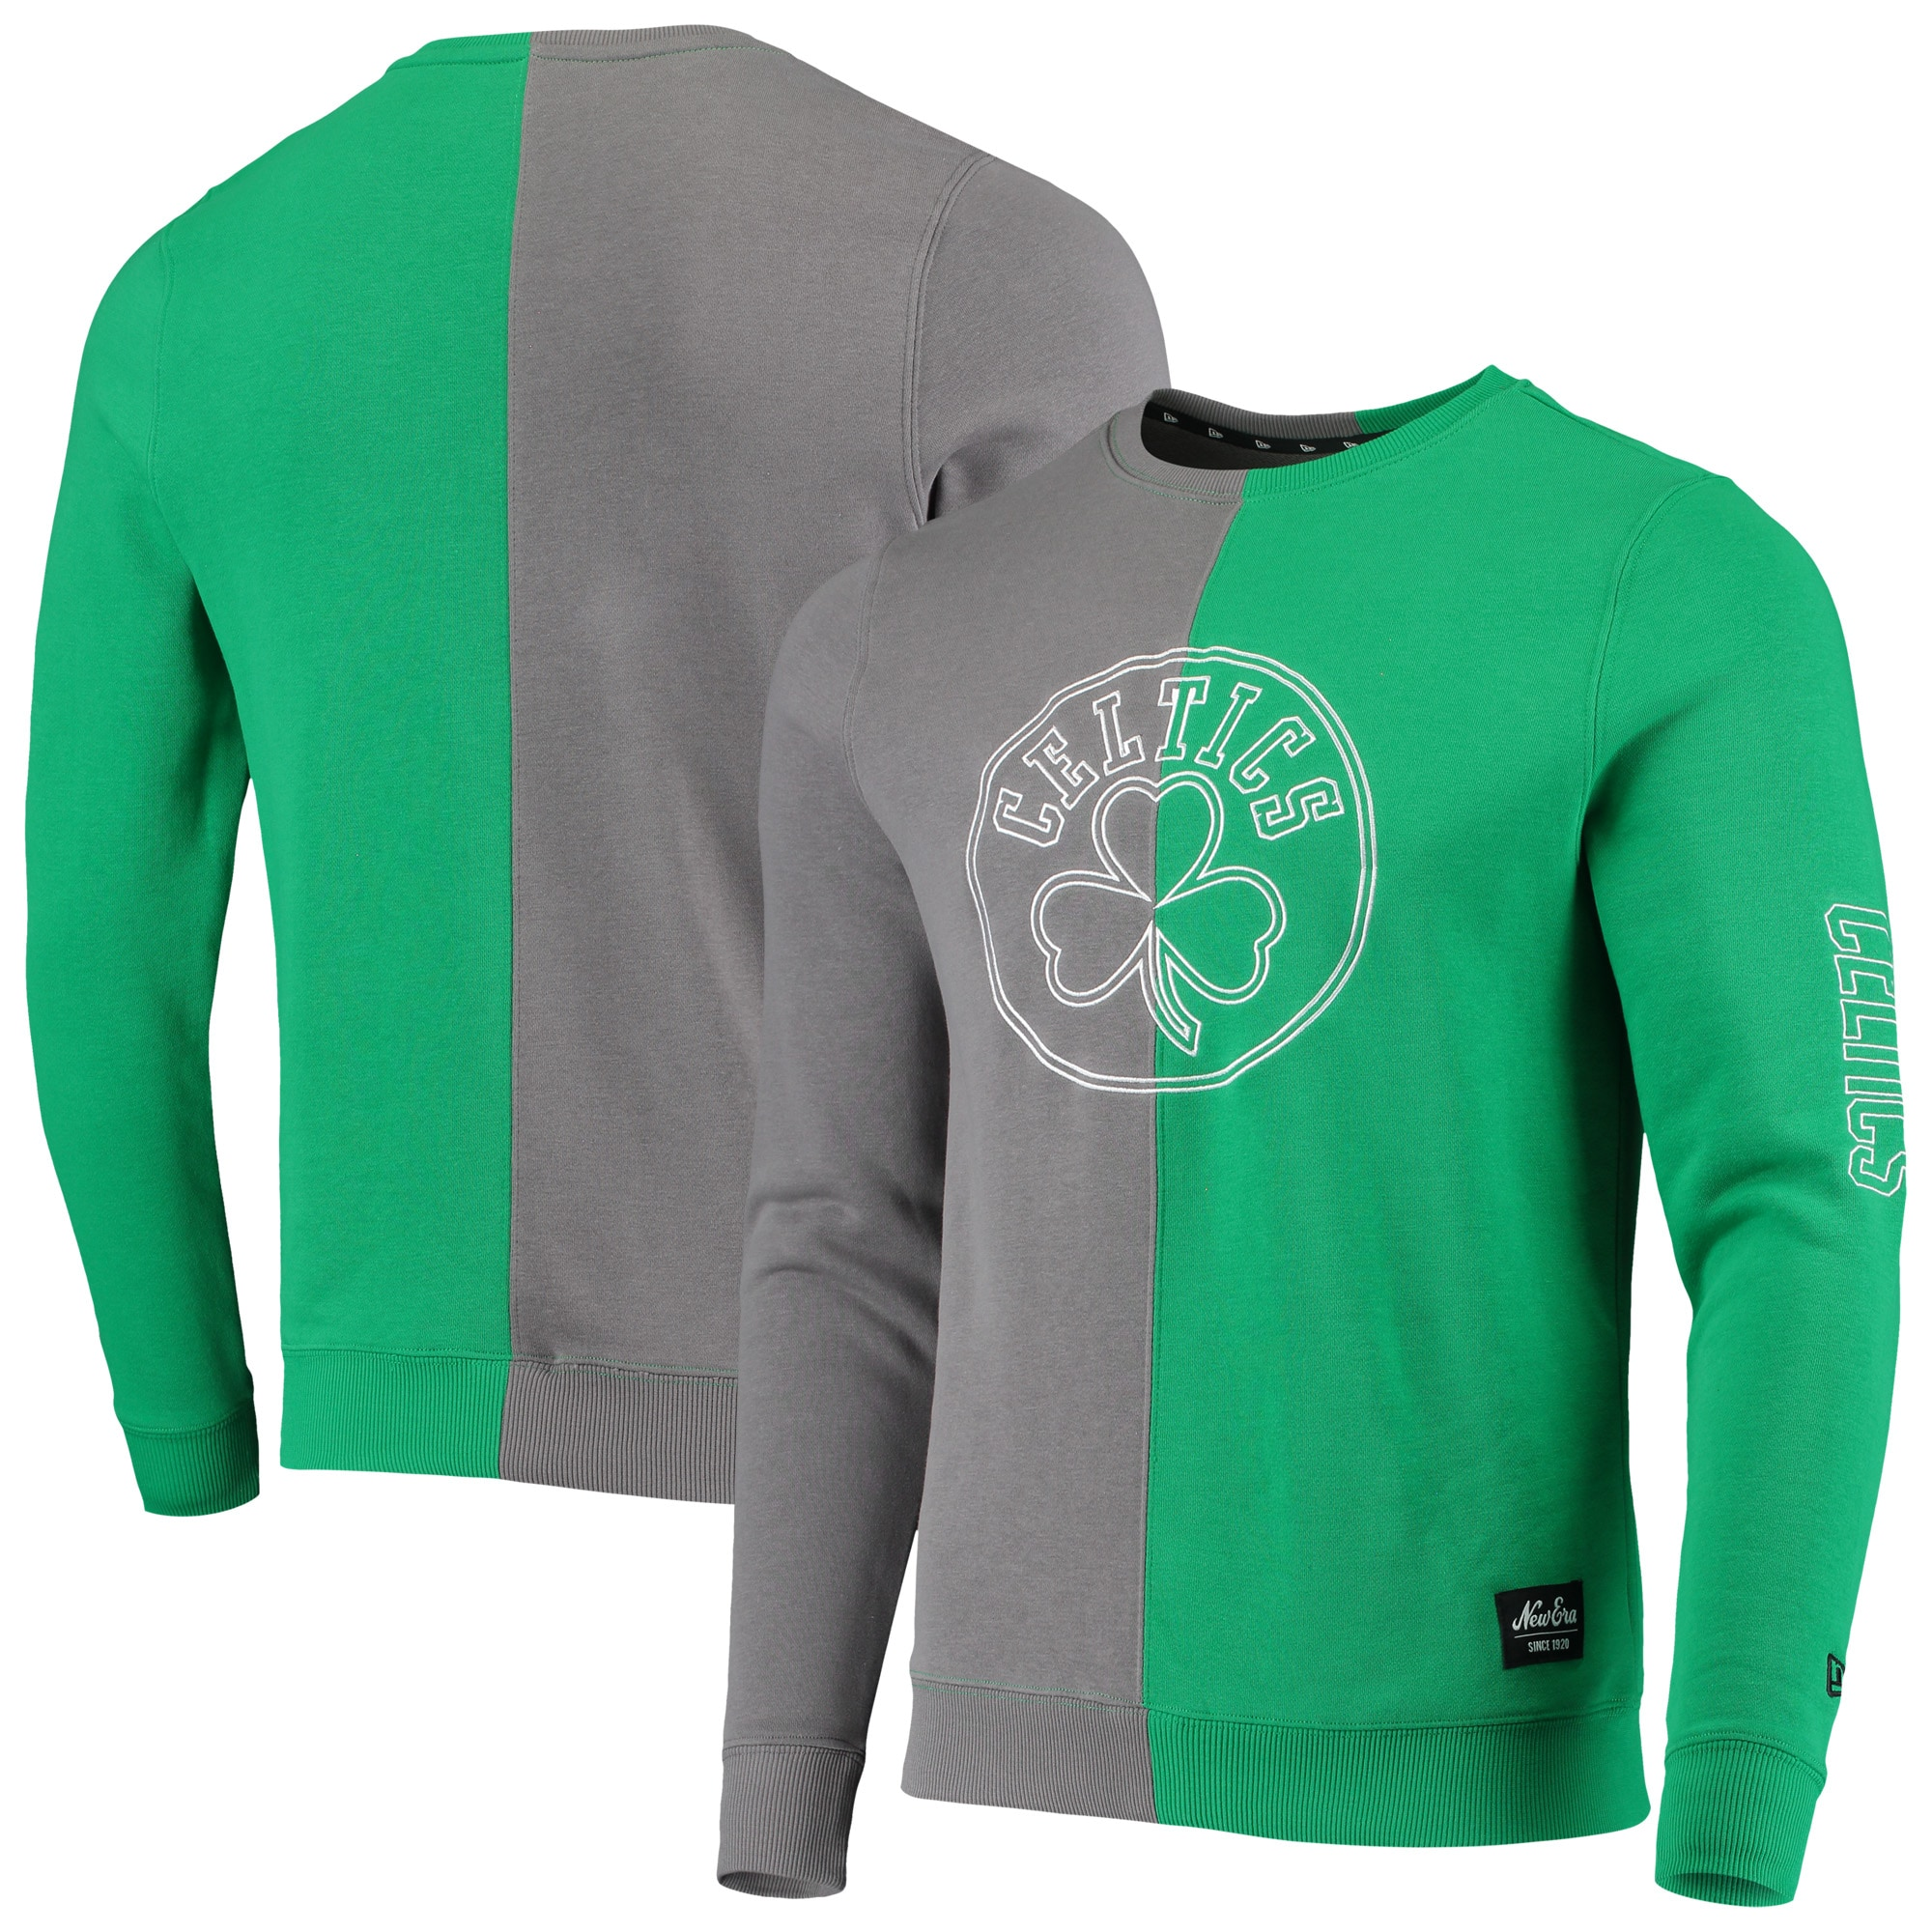 Boston Celtics New Era Diagonal French Terry Color Block Pullover Sweatshirt - Gray/Kelly Green